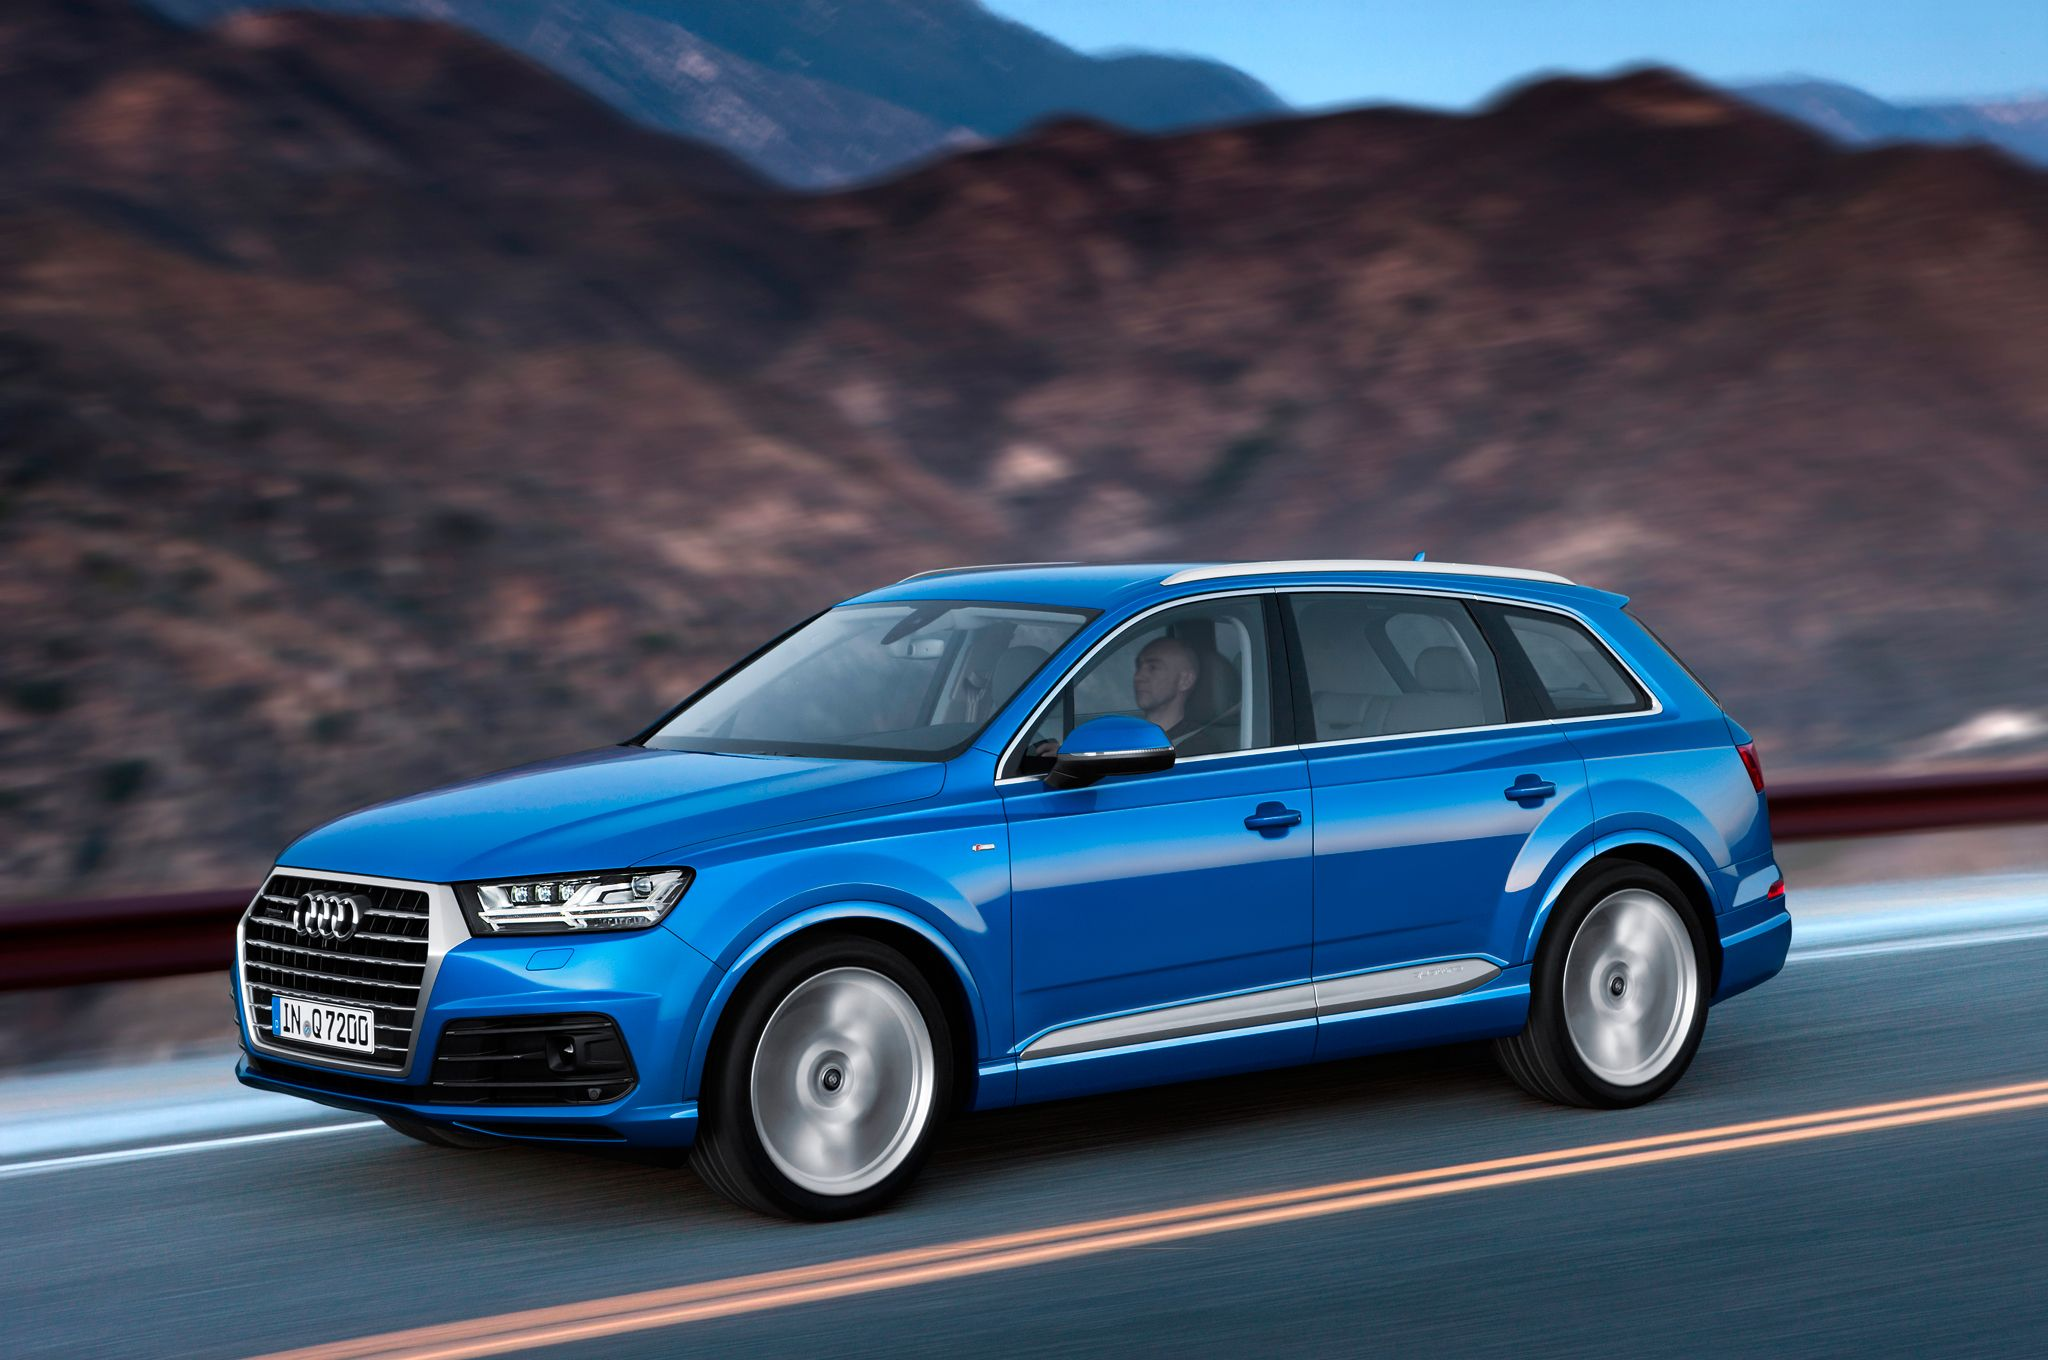 New Audi Q Car Design Get Your Wallet Ready Check - Audi car insurance